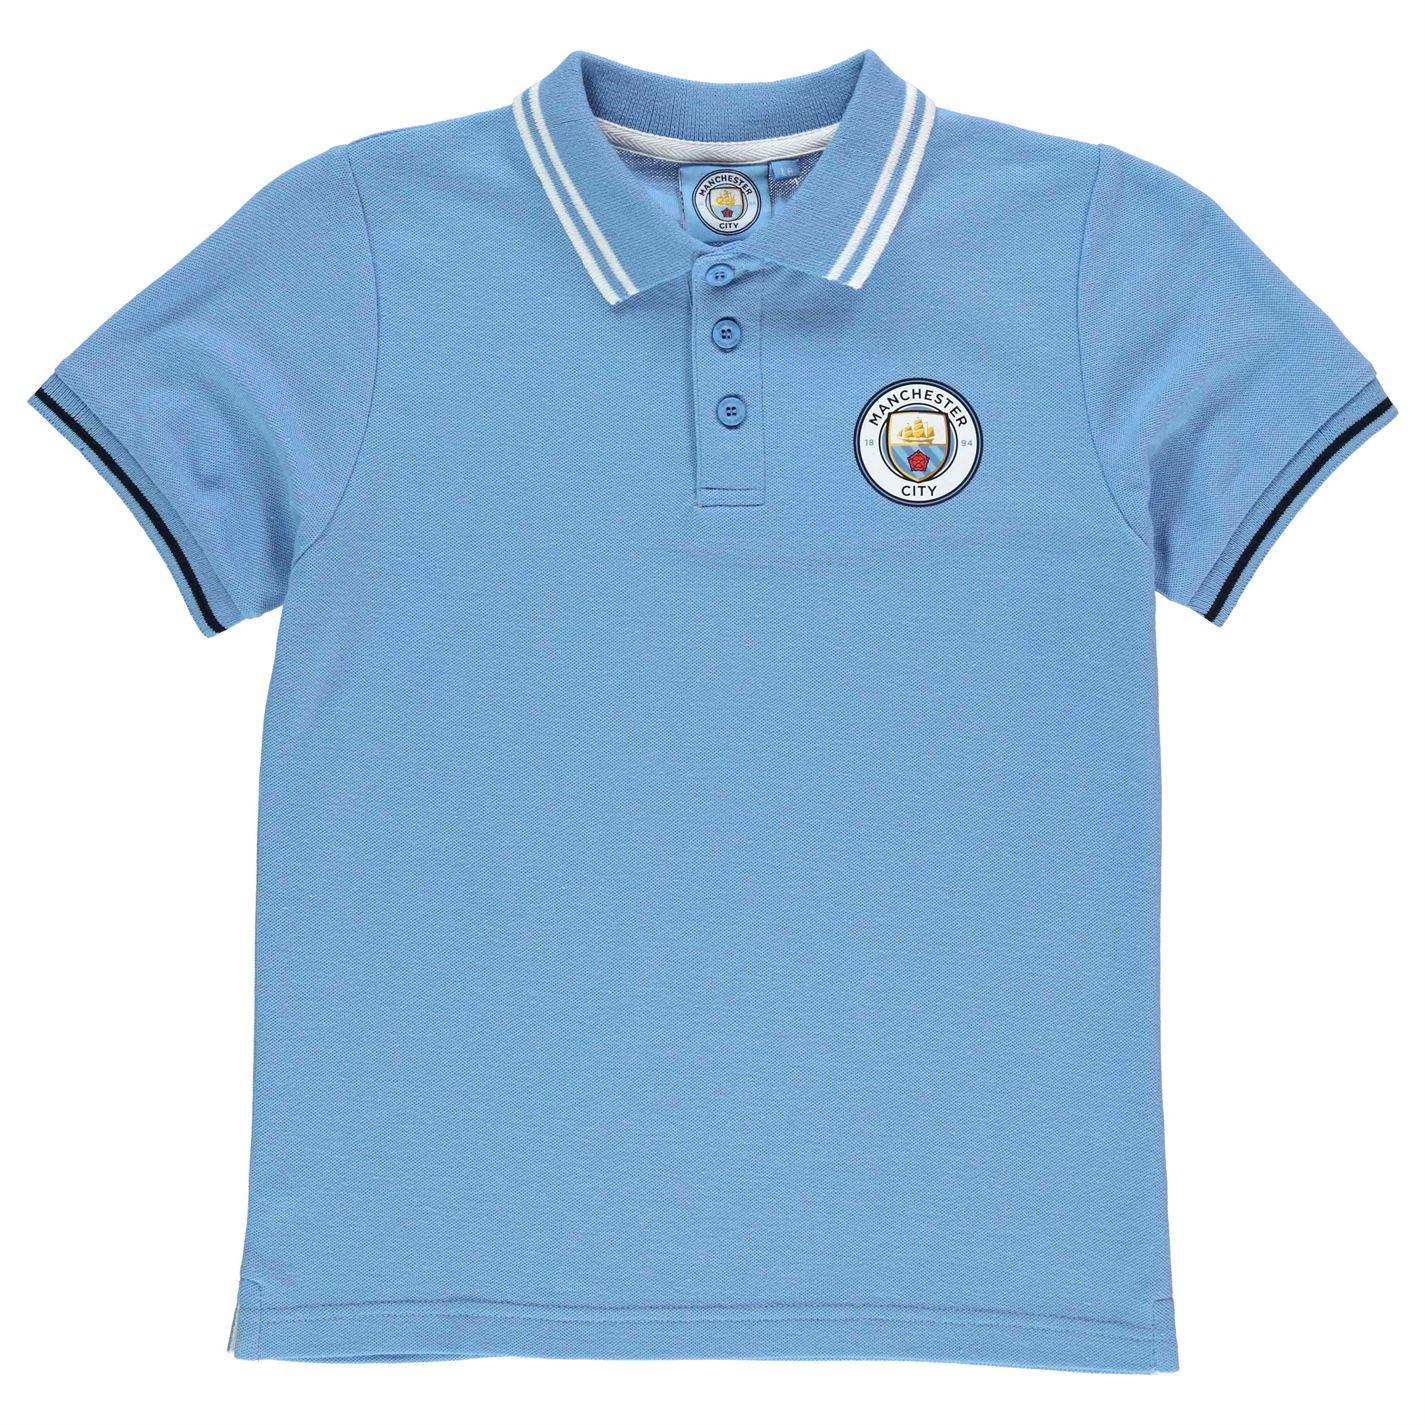 Manchester City Shirt Buy - BCD Tofu House 4ef8c3696